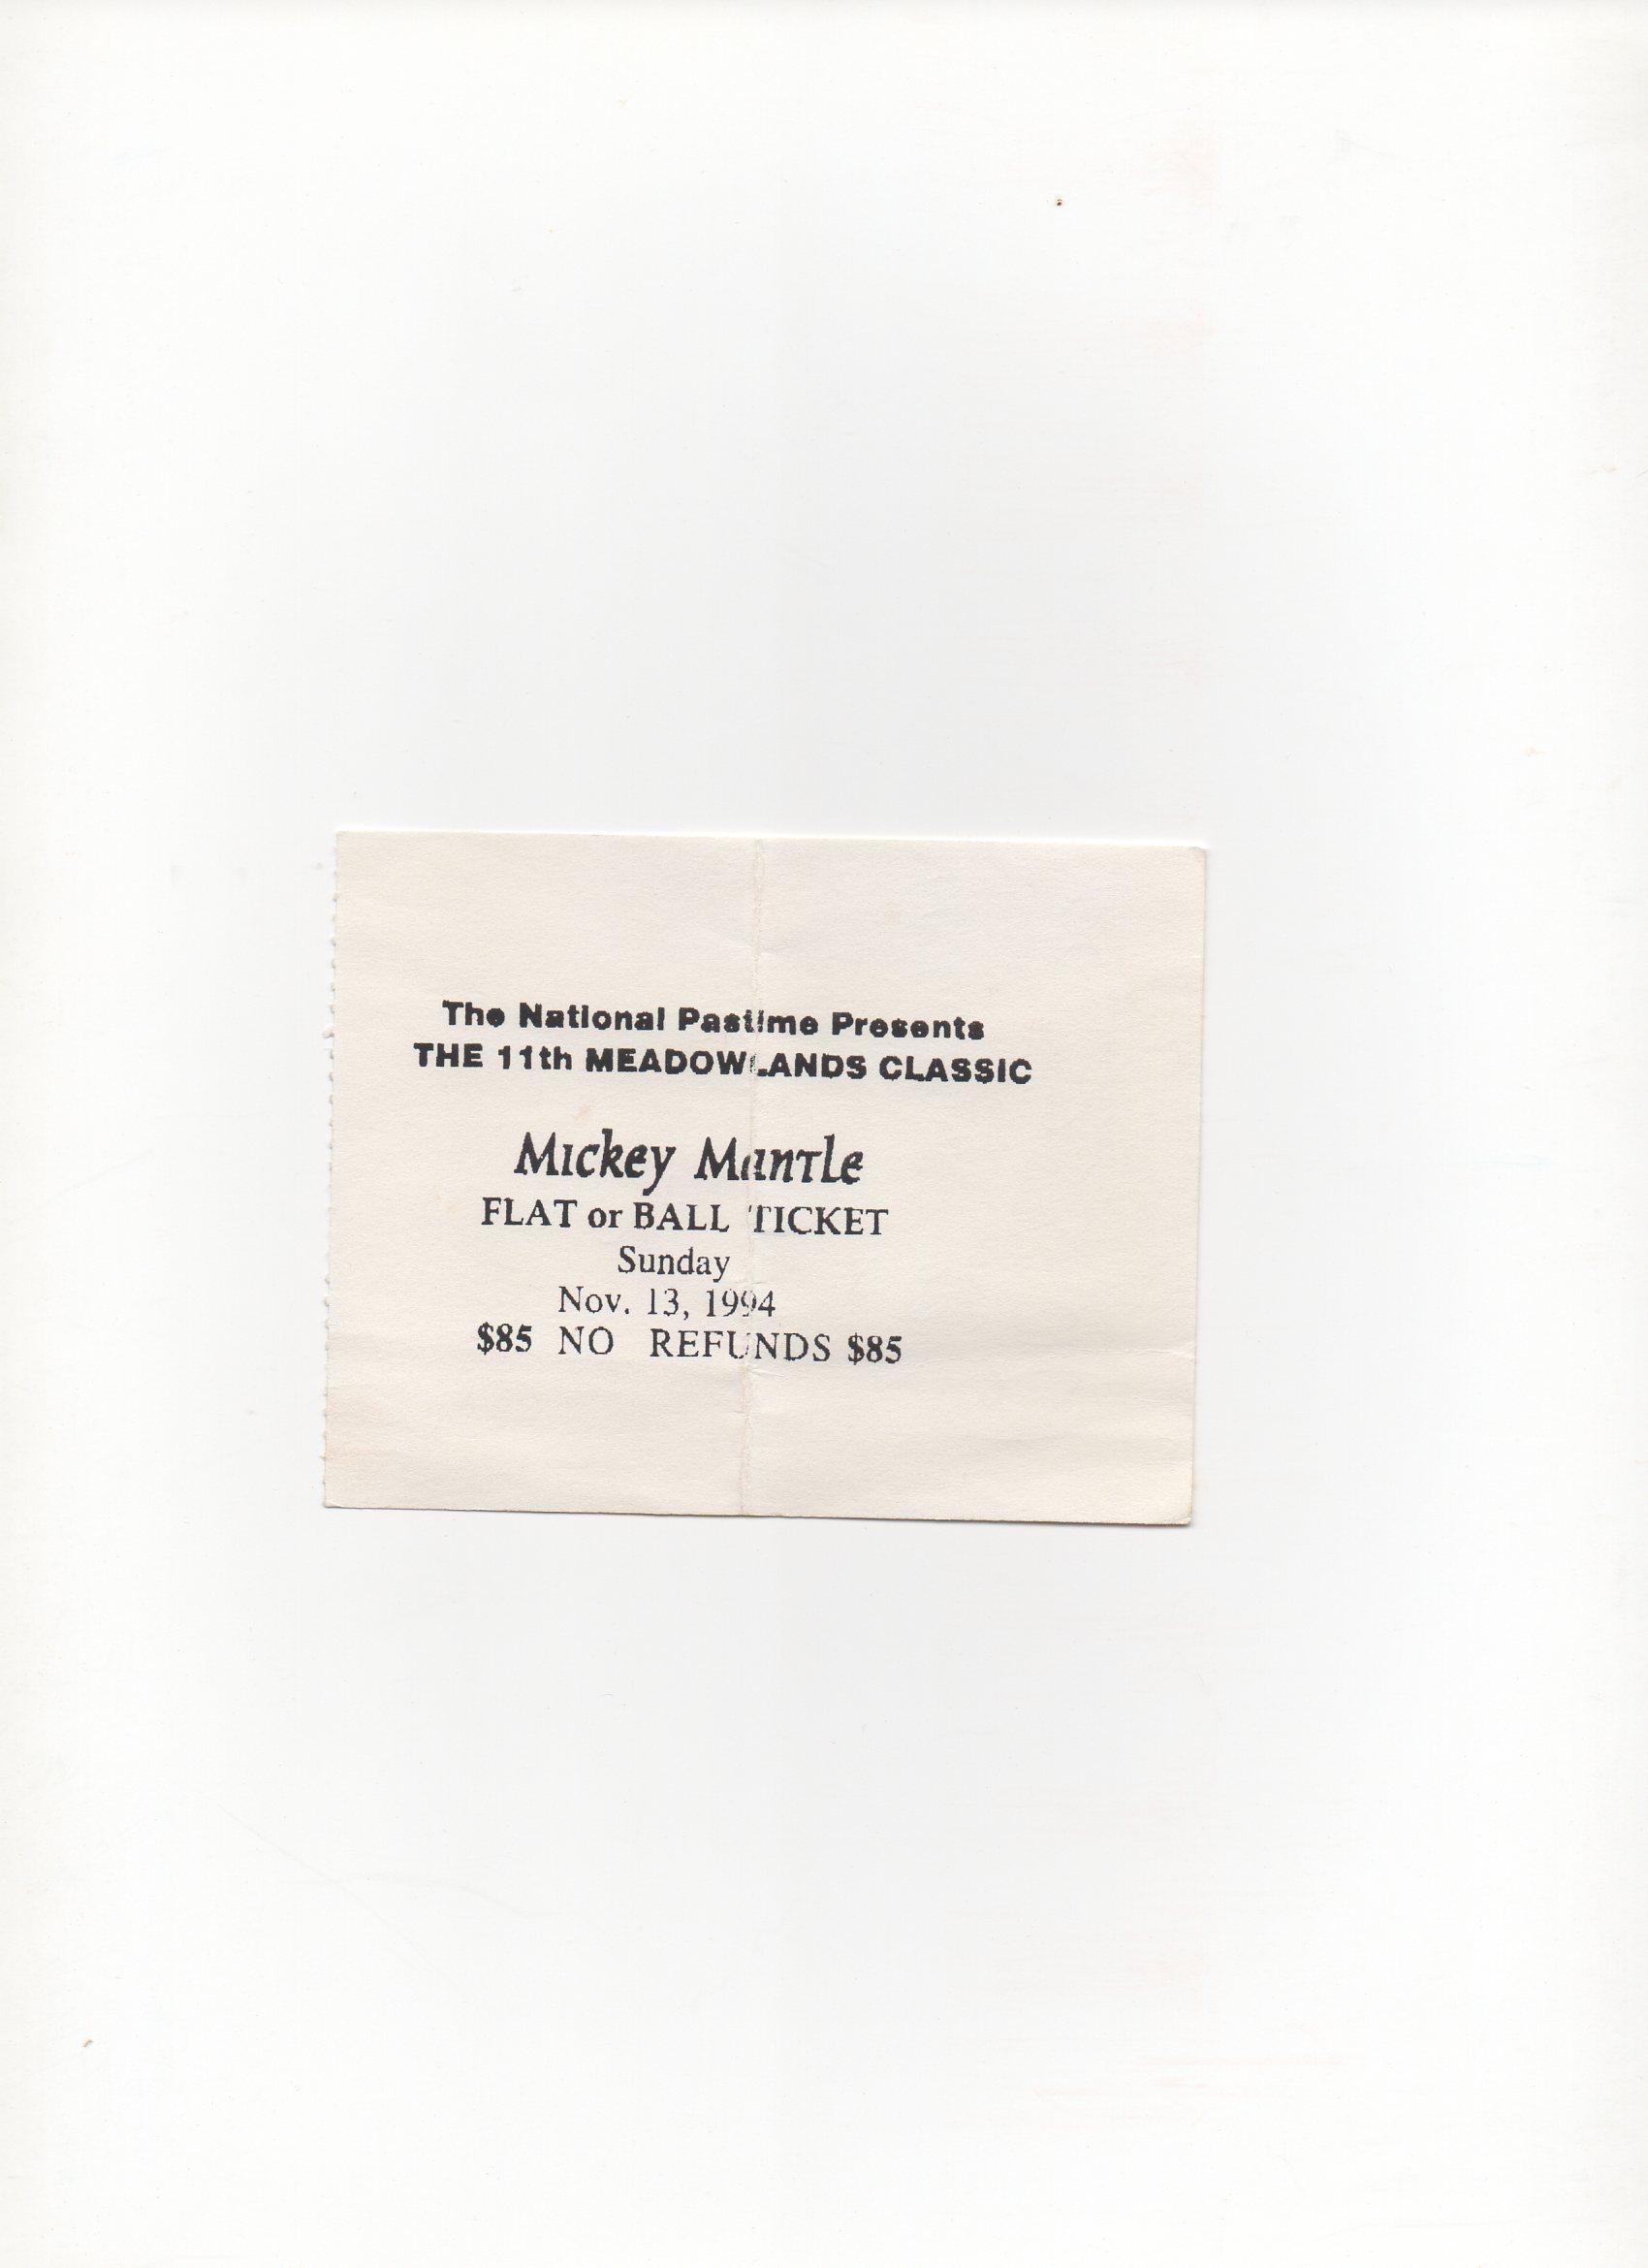 1994 ticket